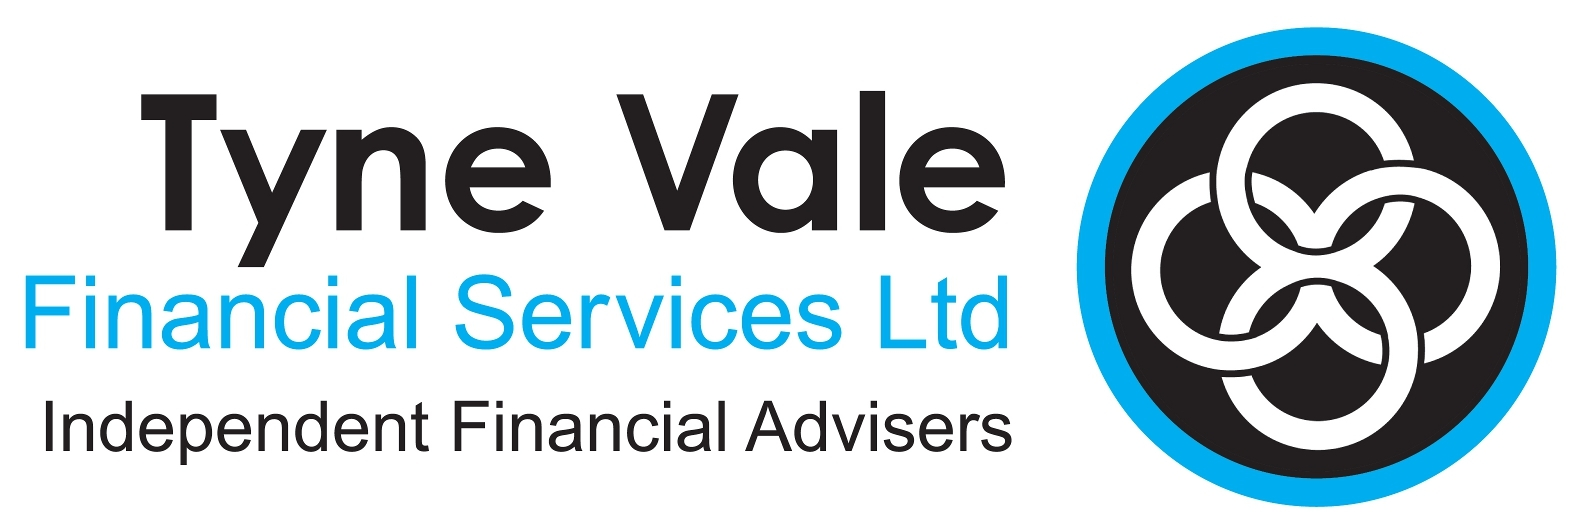 Tyne Vale Financial Services Ltd